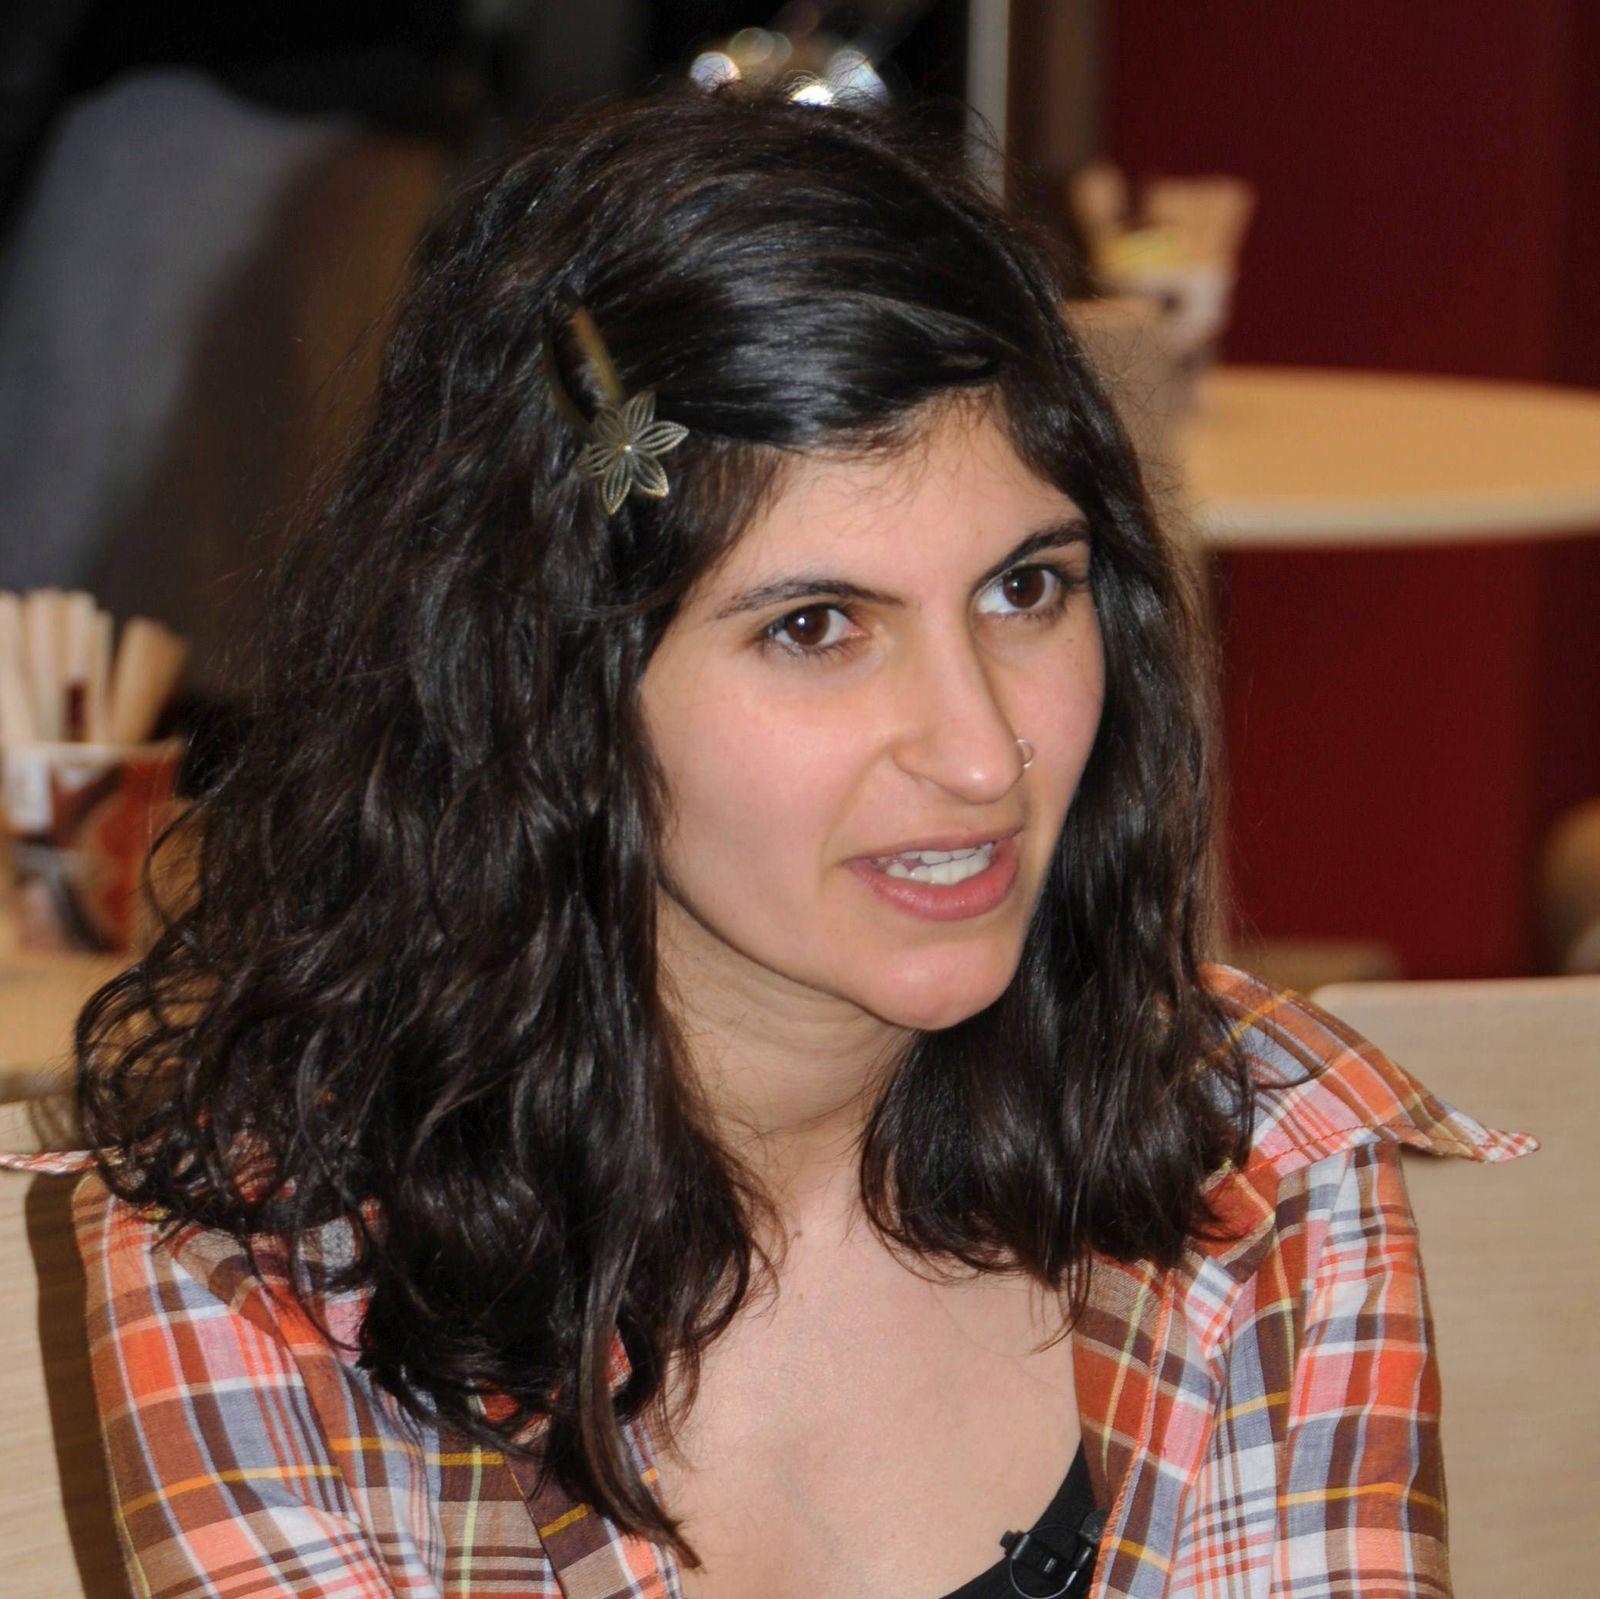 Shida Bazyar auf der Buchmesse in Leipzig